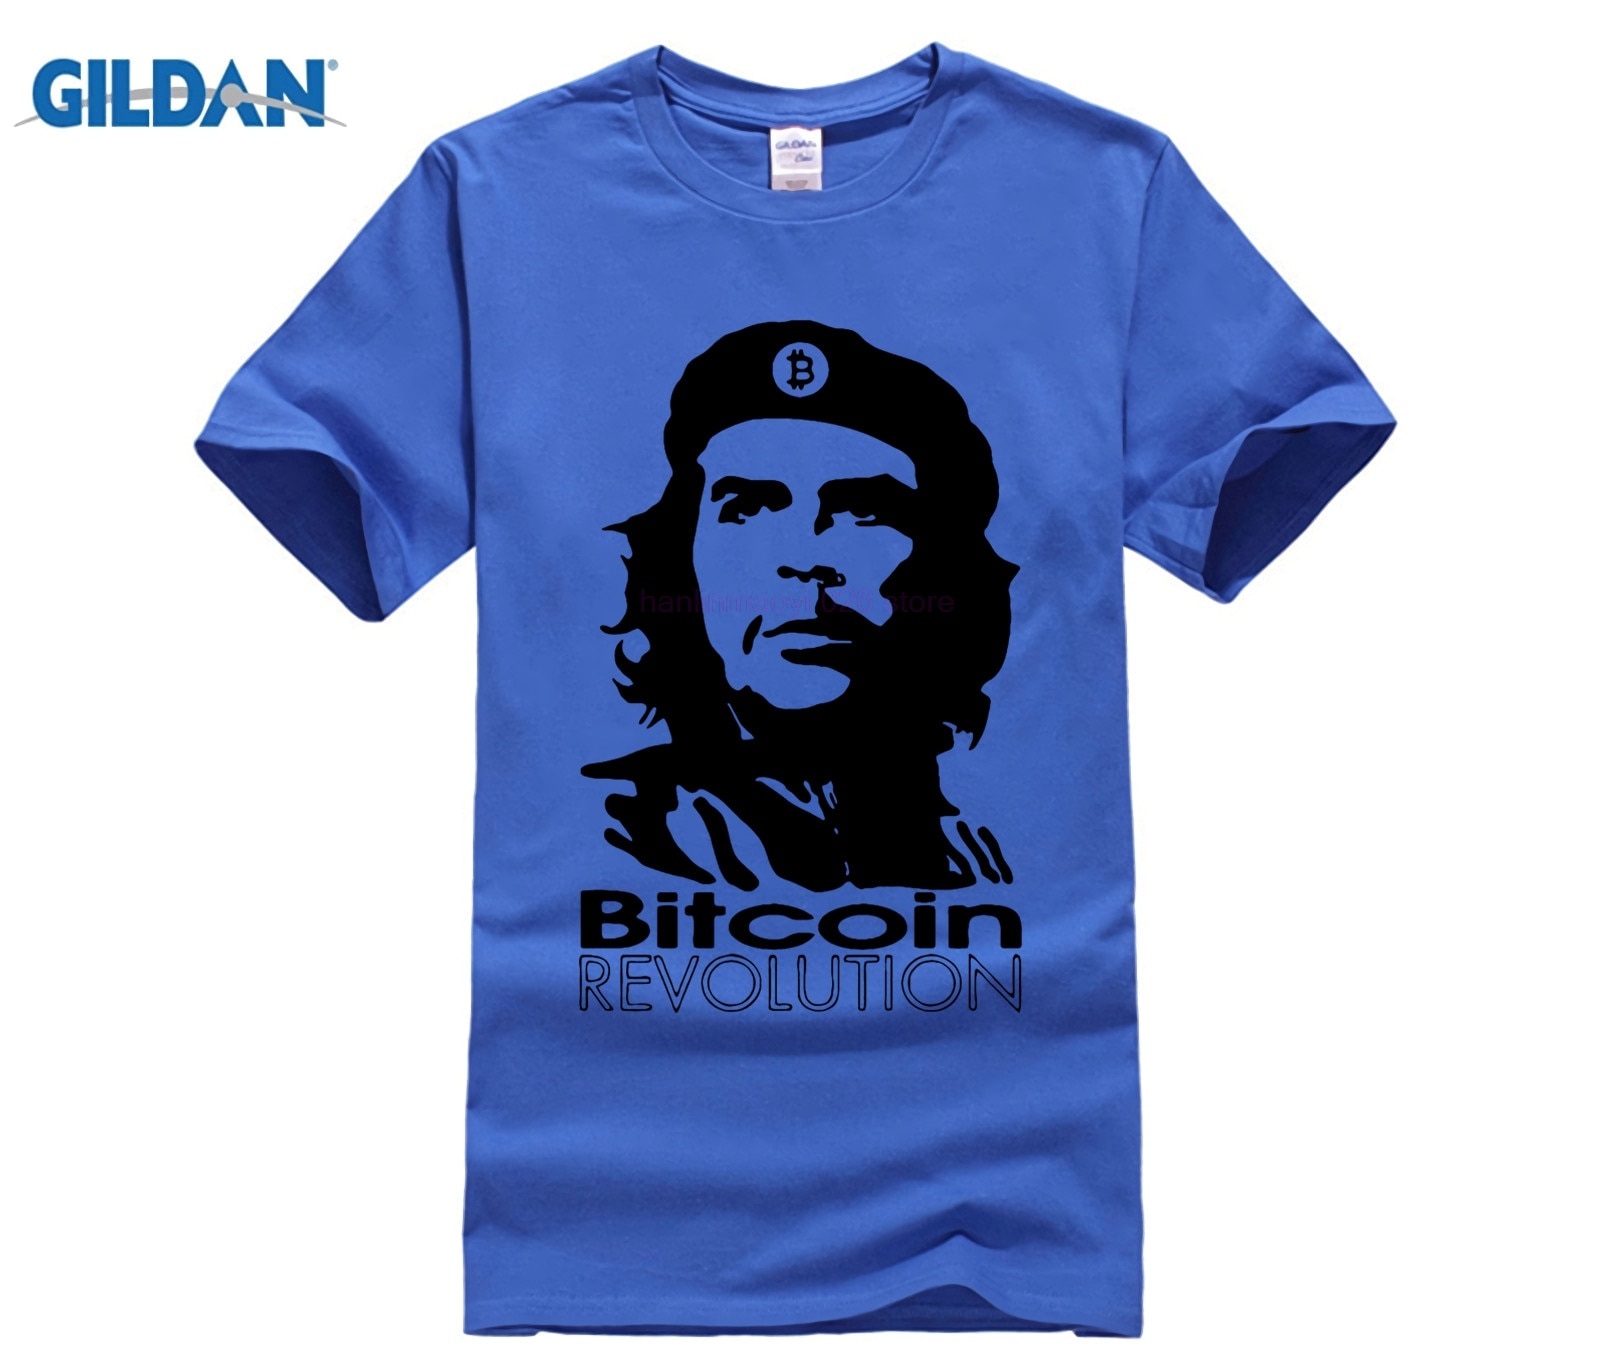 Diseño divertido Bitcoin revolución Ernesto Guevara camiseta Che Guevara Cool camisetas hombres 100% algodón d Tshirs 2019